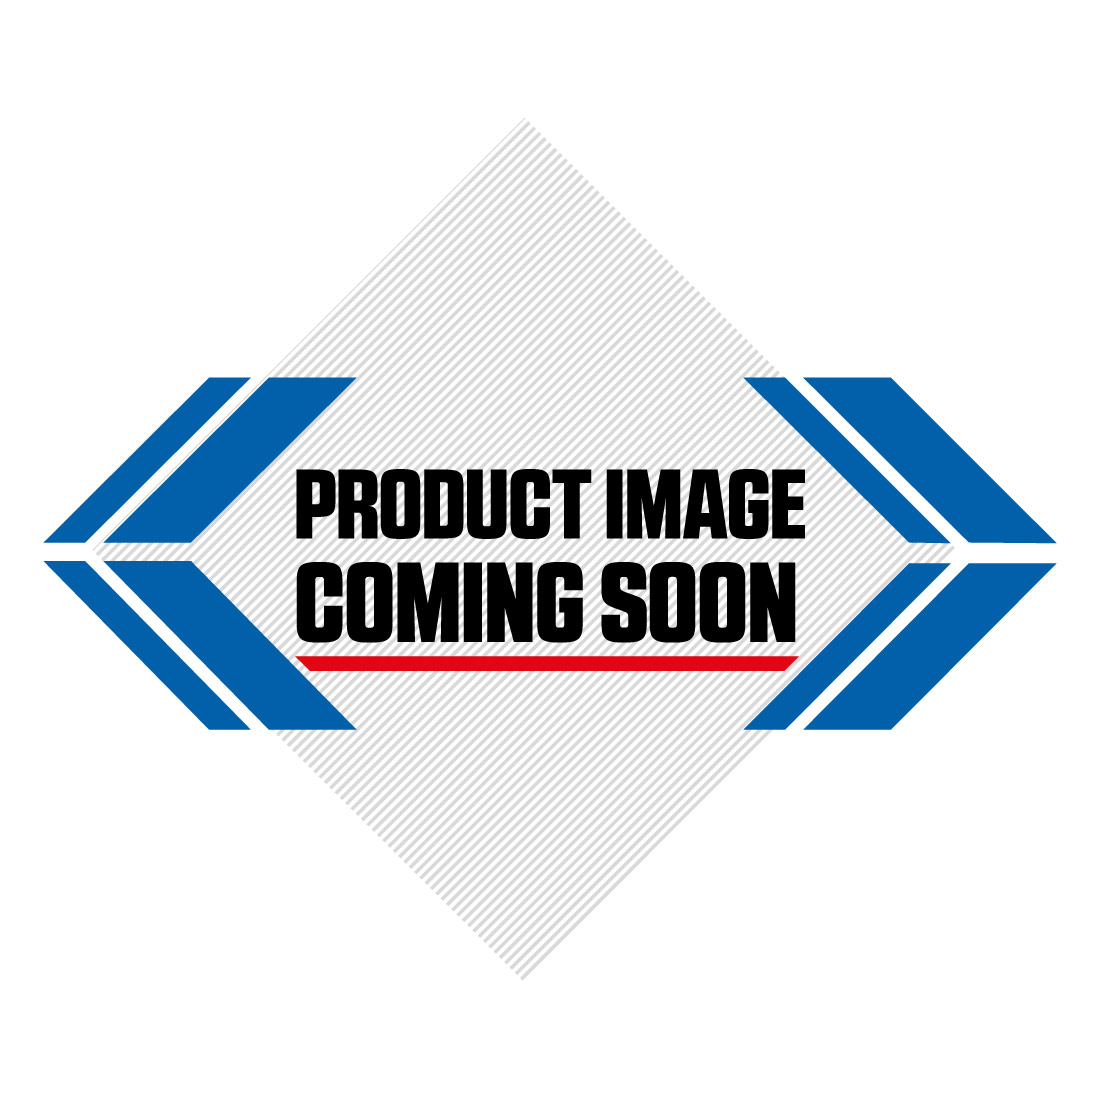 Renthal Twinring Rear Sprocket KTM SX SX-F EXC EXC-F Husqvarna TC FC TE FE - Black Image-3